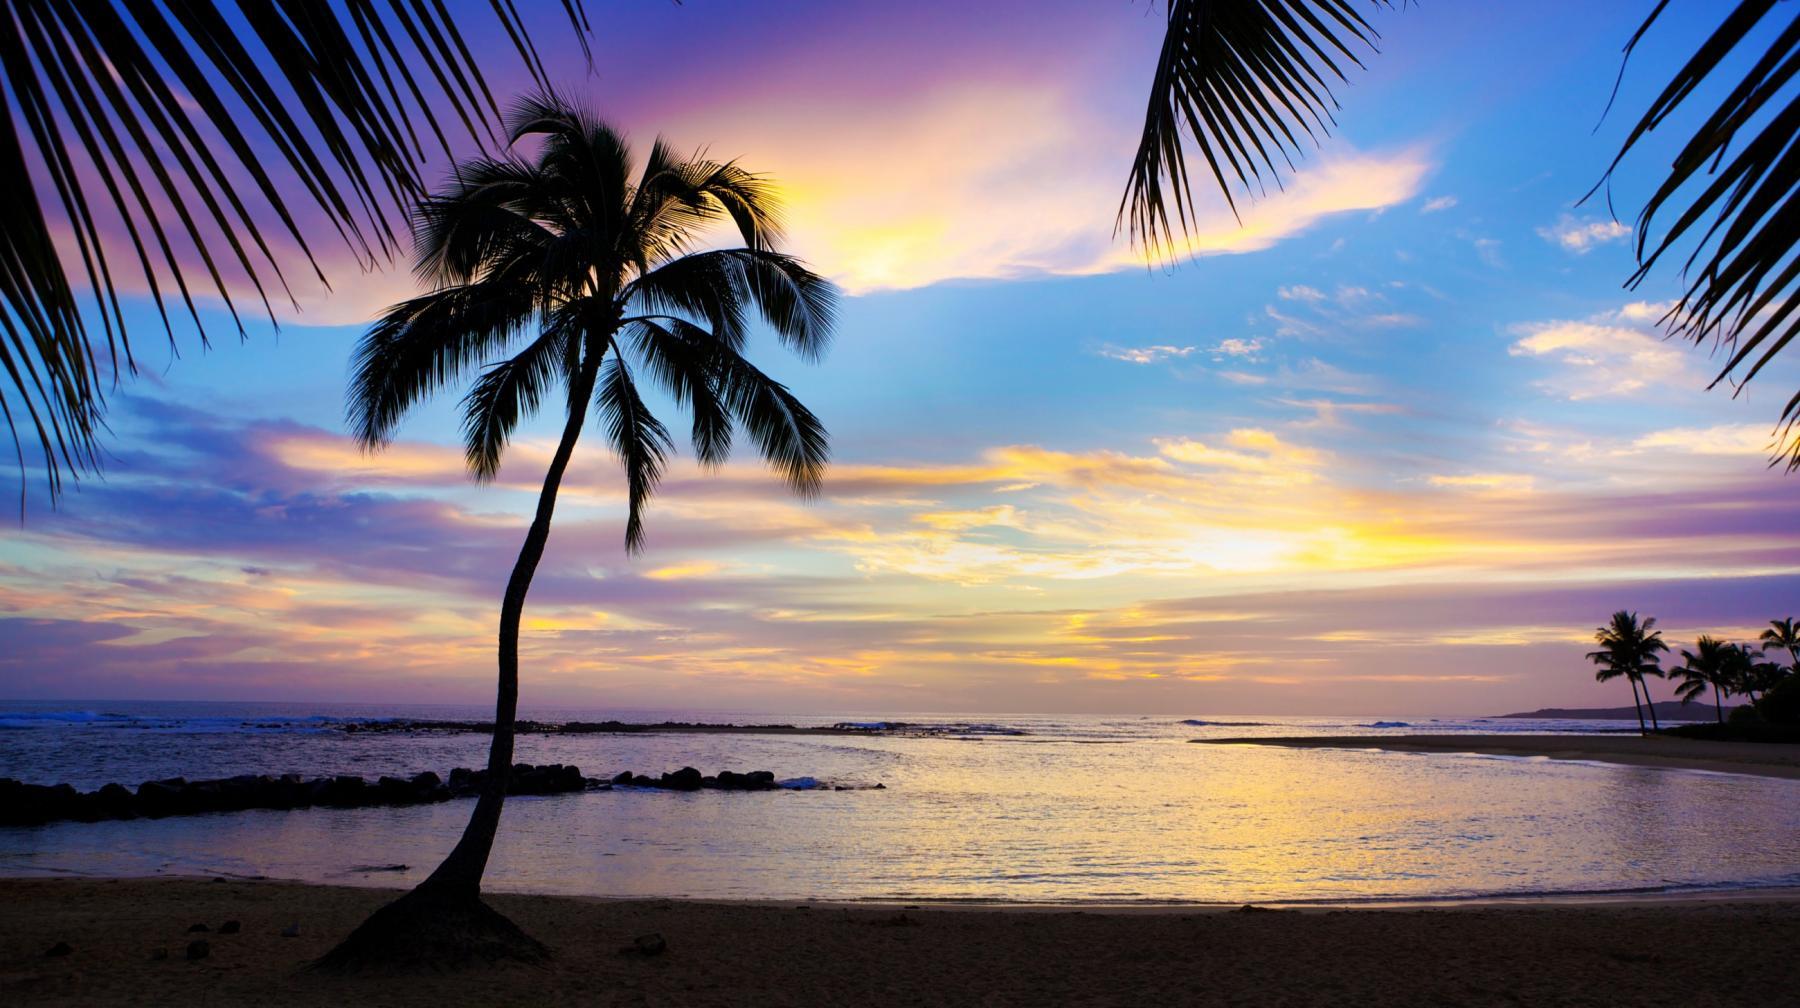 Palm Tree in the Kauai Sunset